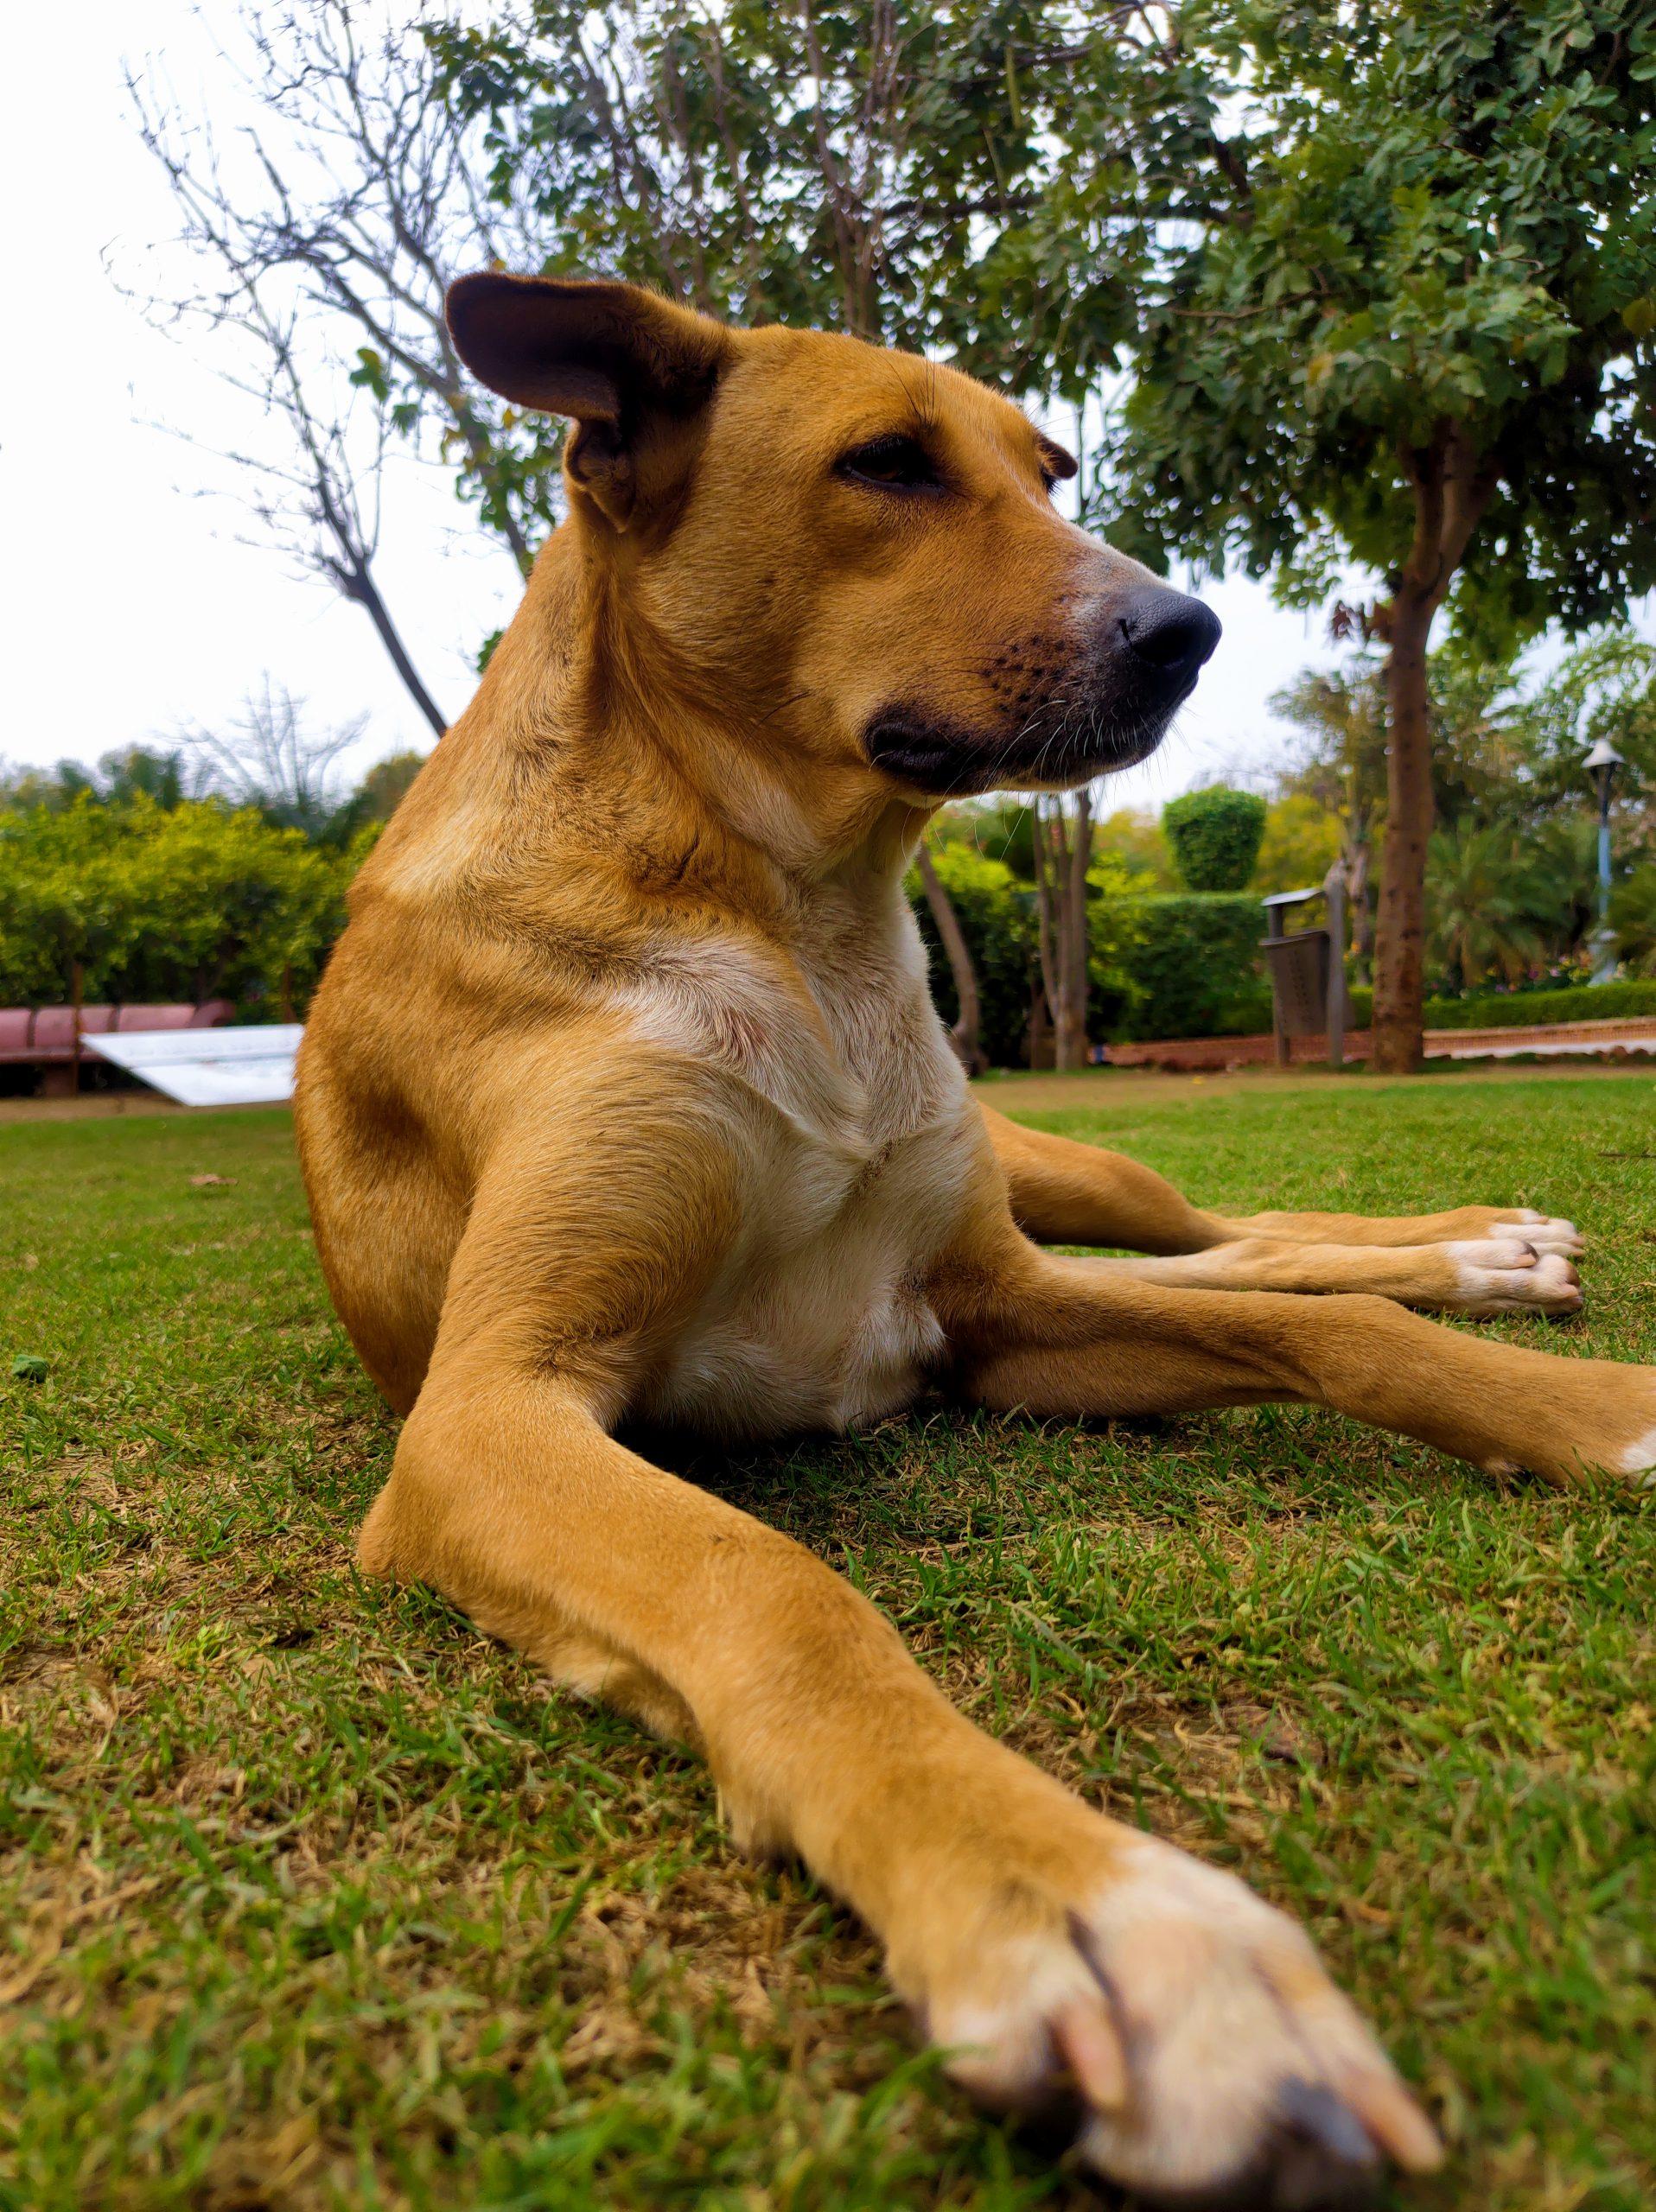 Cute Dog Sitting Outdoor